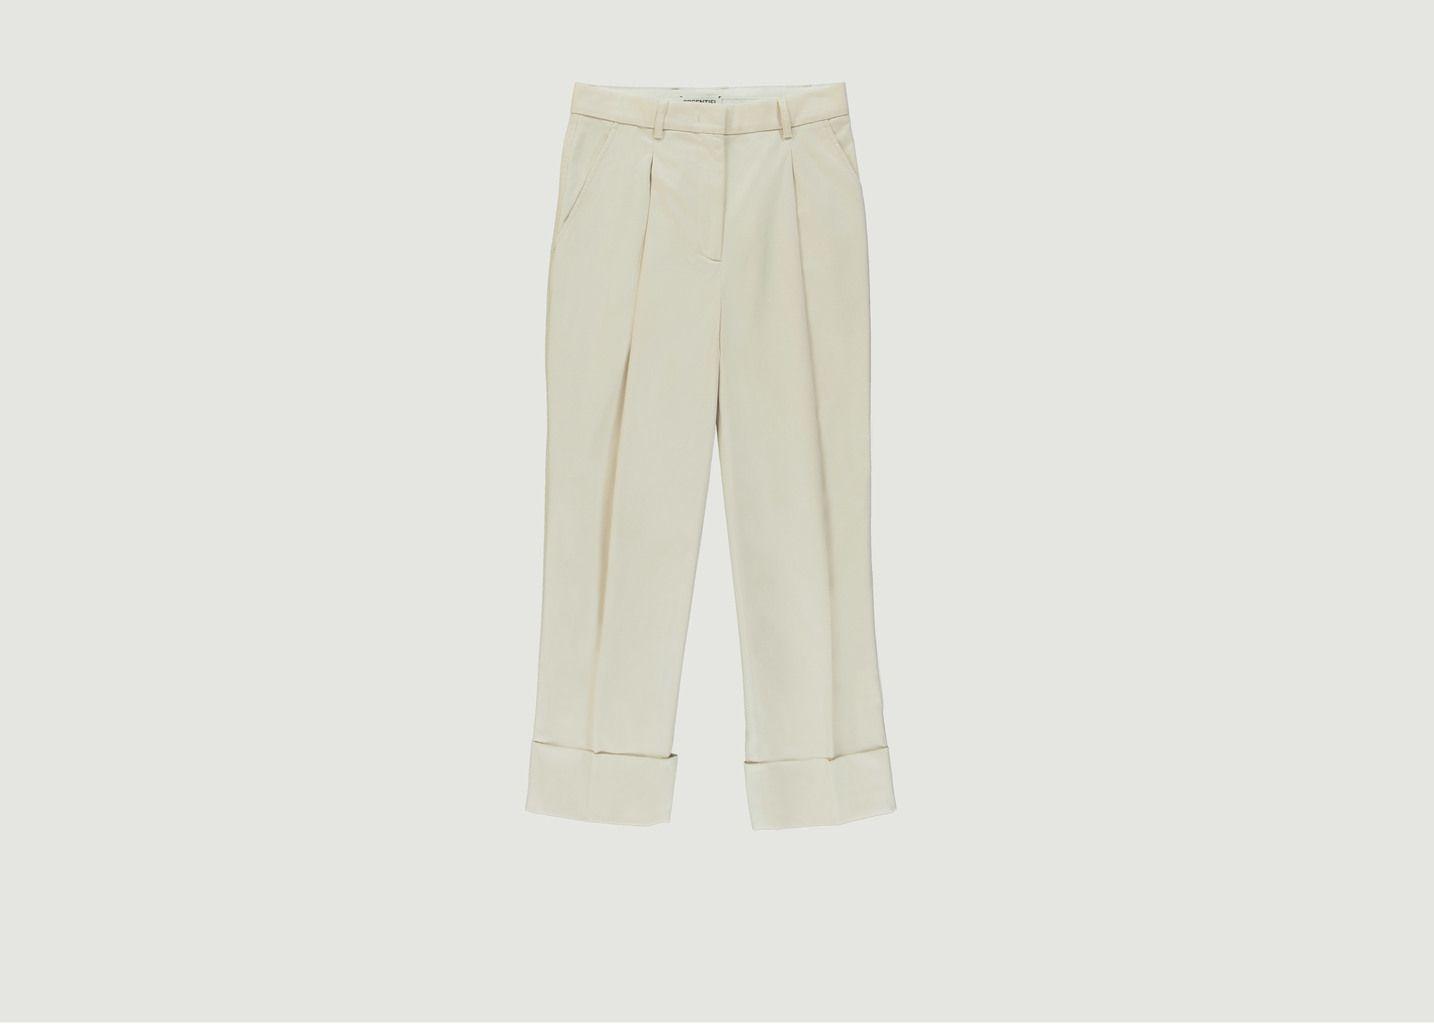 Pantalon 7/8e Vibez - Essentiel Antwerp